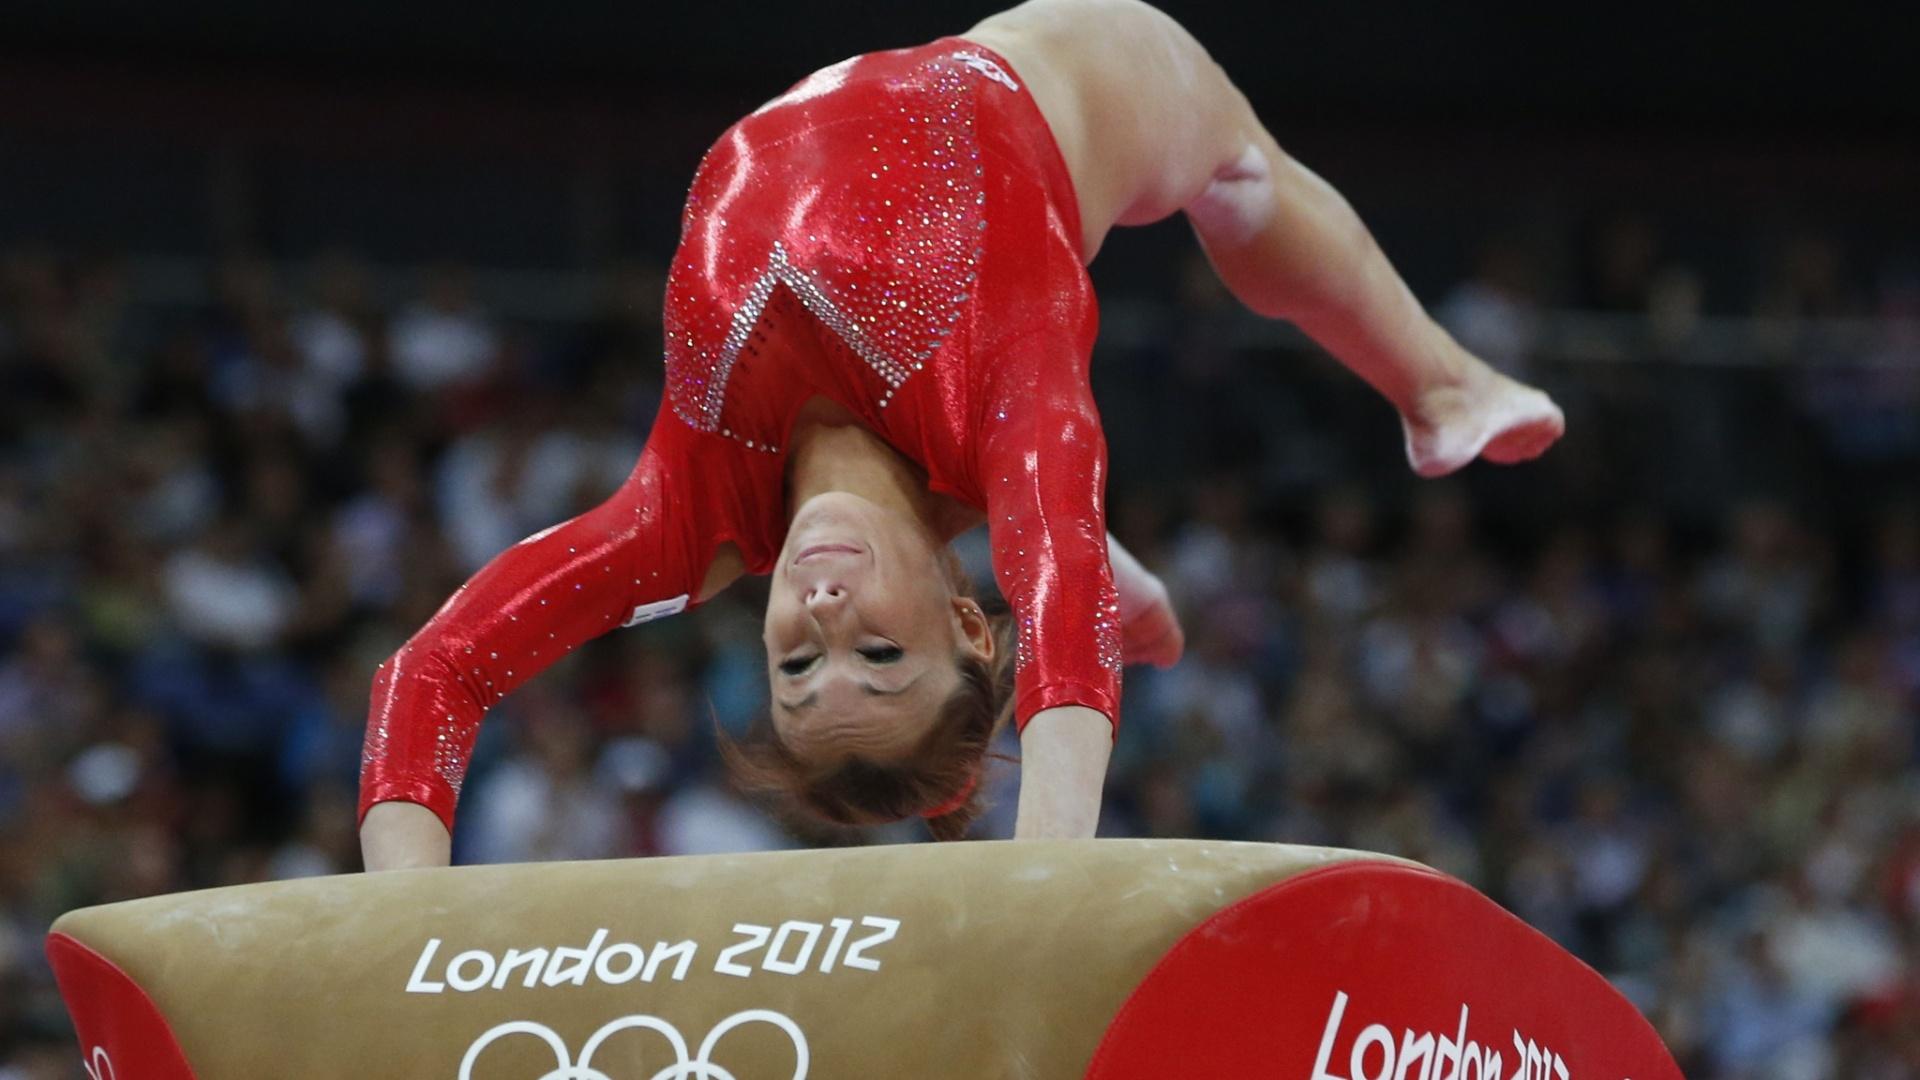 Italiana Vanessa Ferrari 'ataca' a mesa em seu salto na final feminina individual geral desta quinta-feira